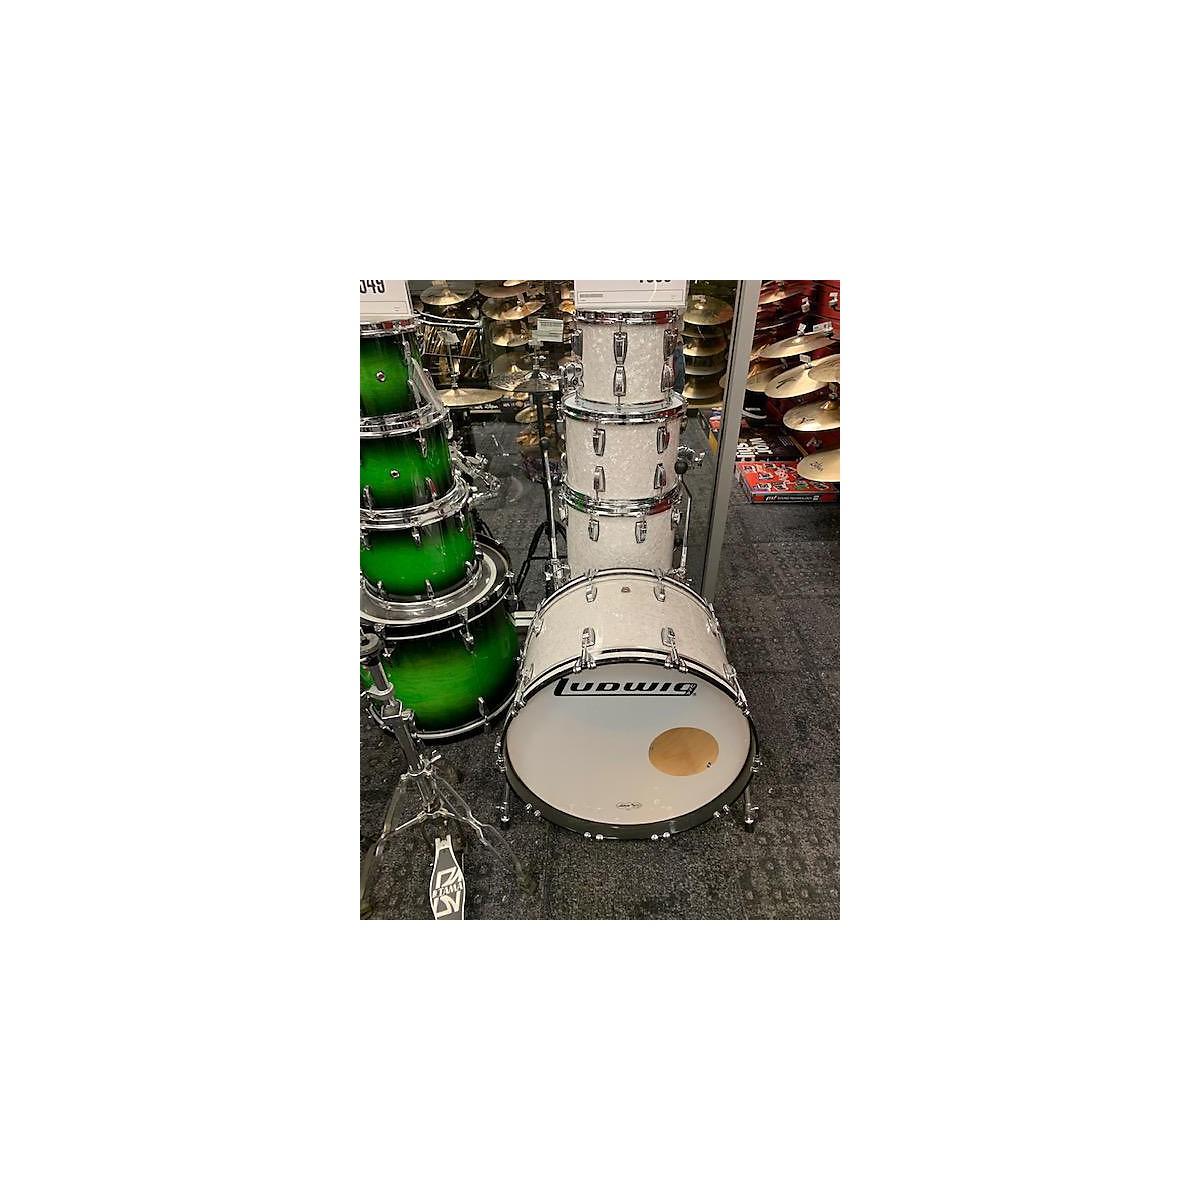 Ludwig Classic Maple Series Drum Kit